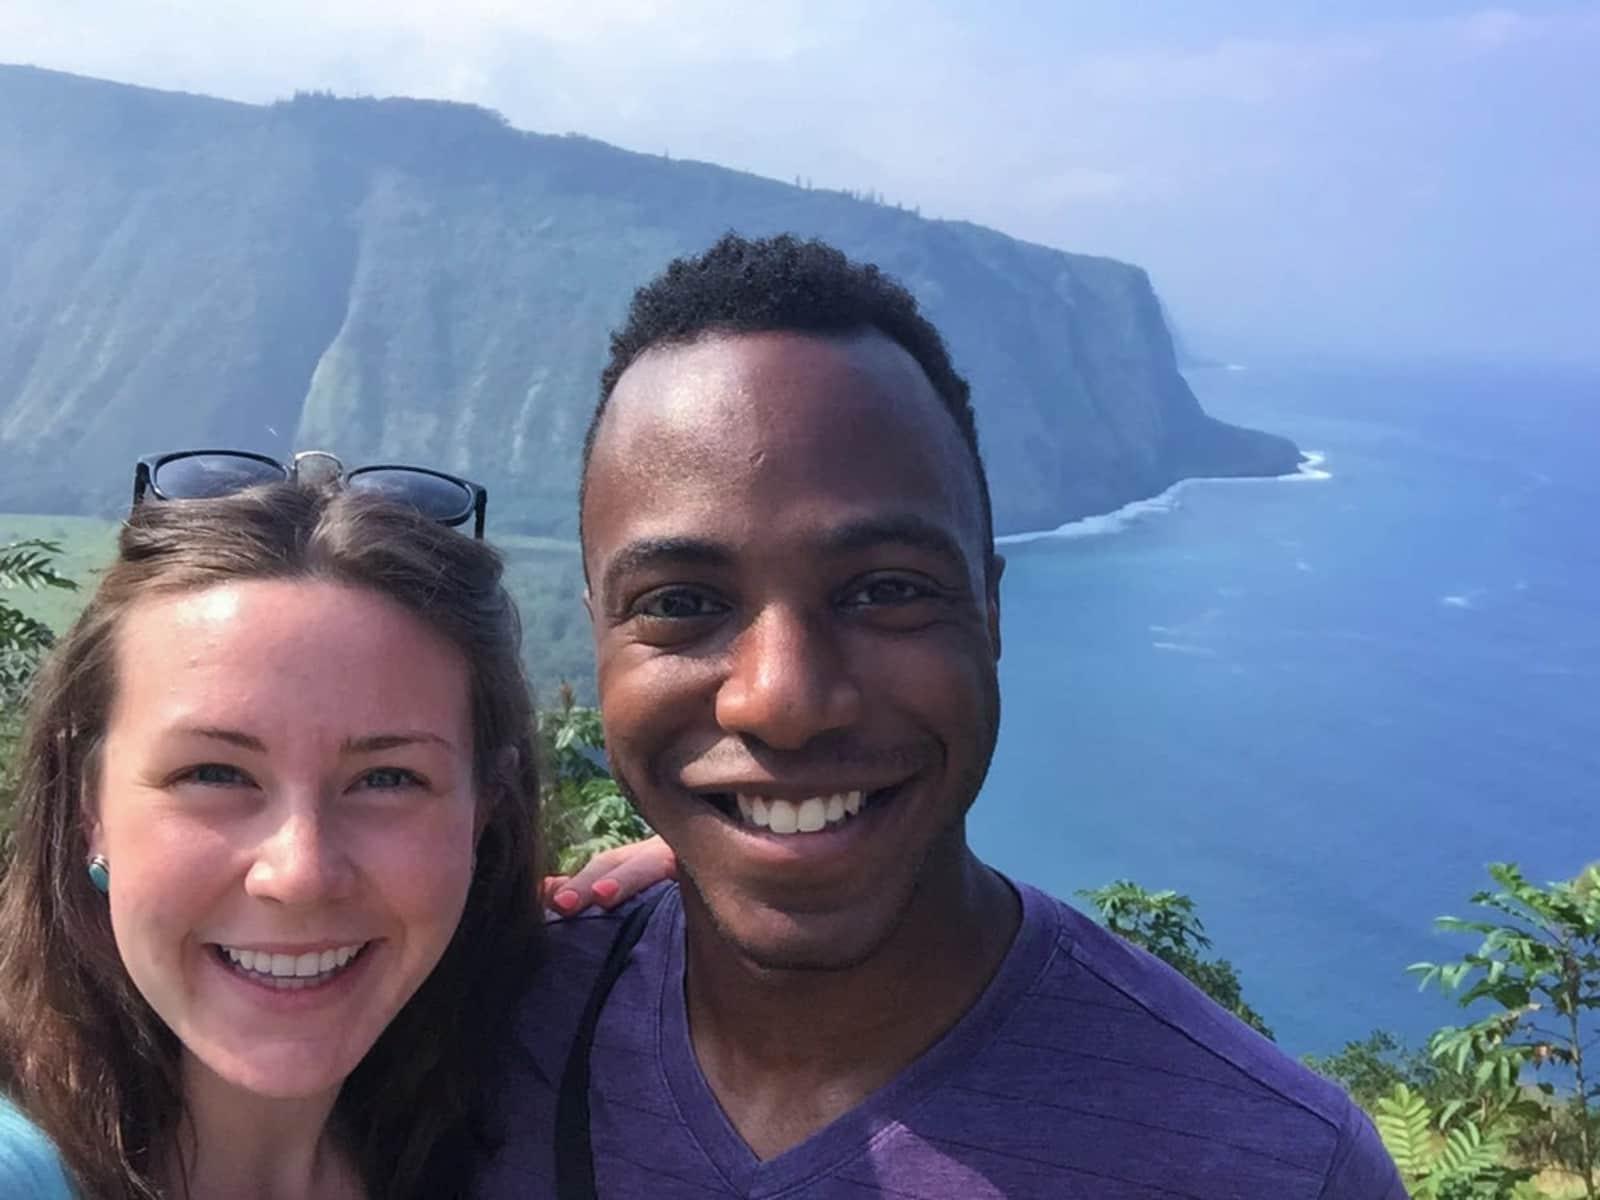 Lara & Jabari from St. Louis, Missouri, United States